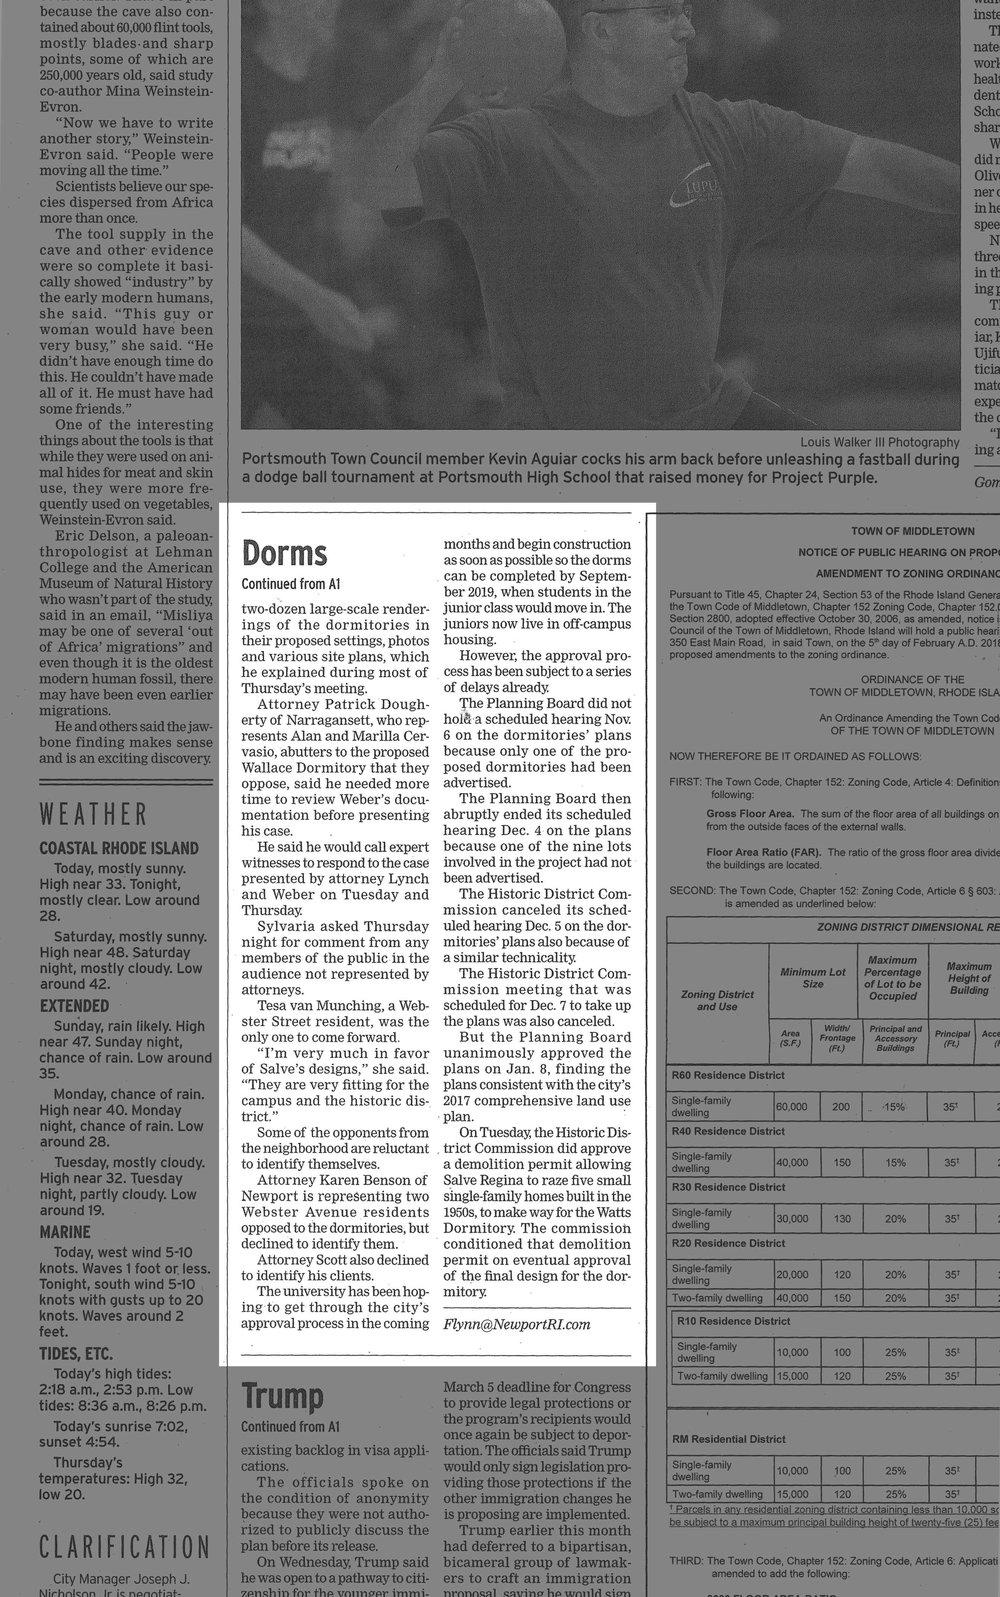 The Newport Daily News_2.jpg